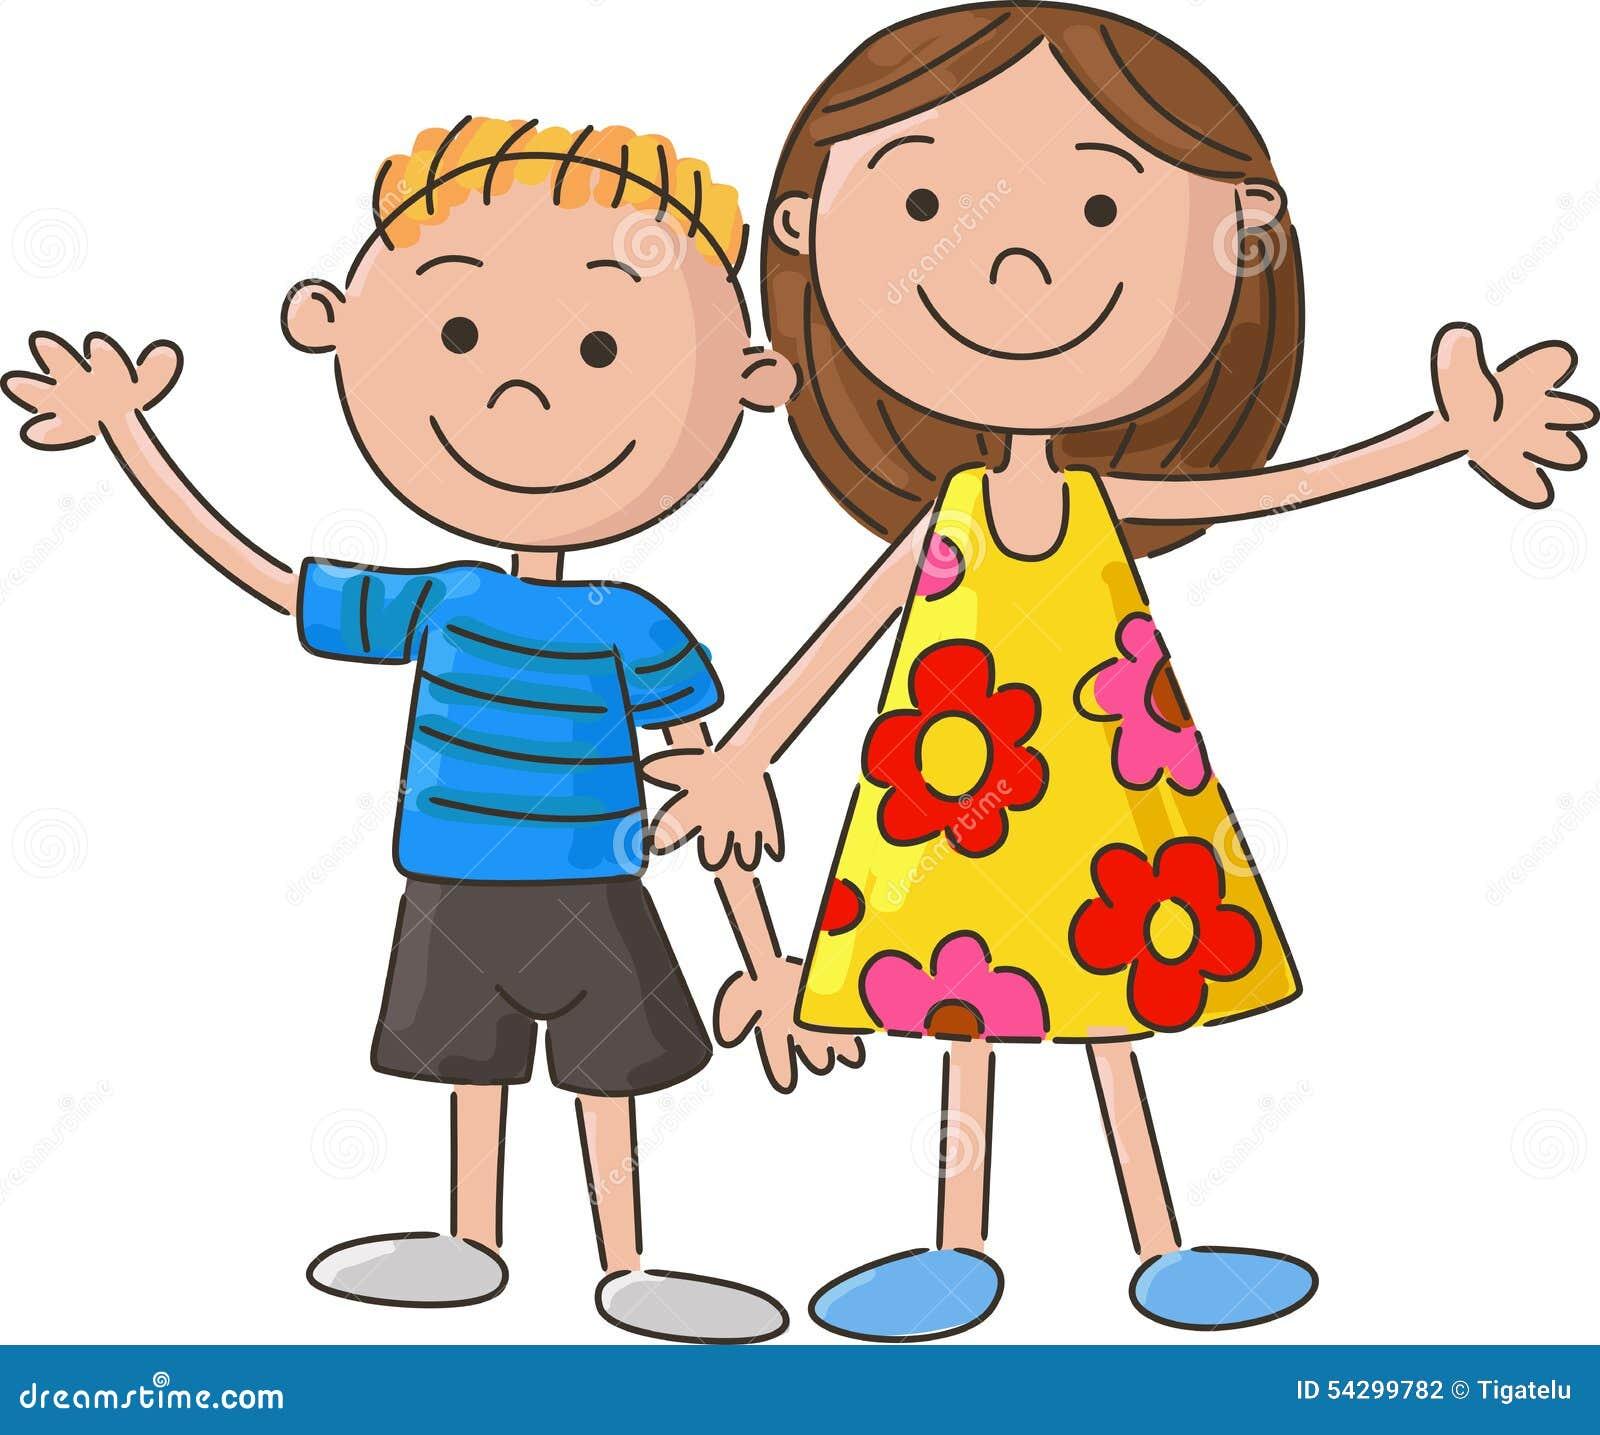 Uncategorized Cartoon Little Kids cartoon little kids holding hand stock vector image 54299782 royalty free download kids